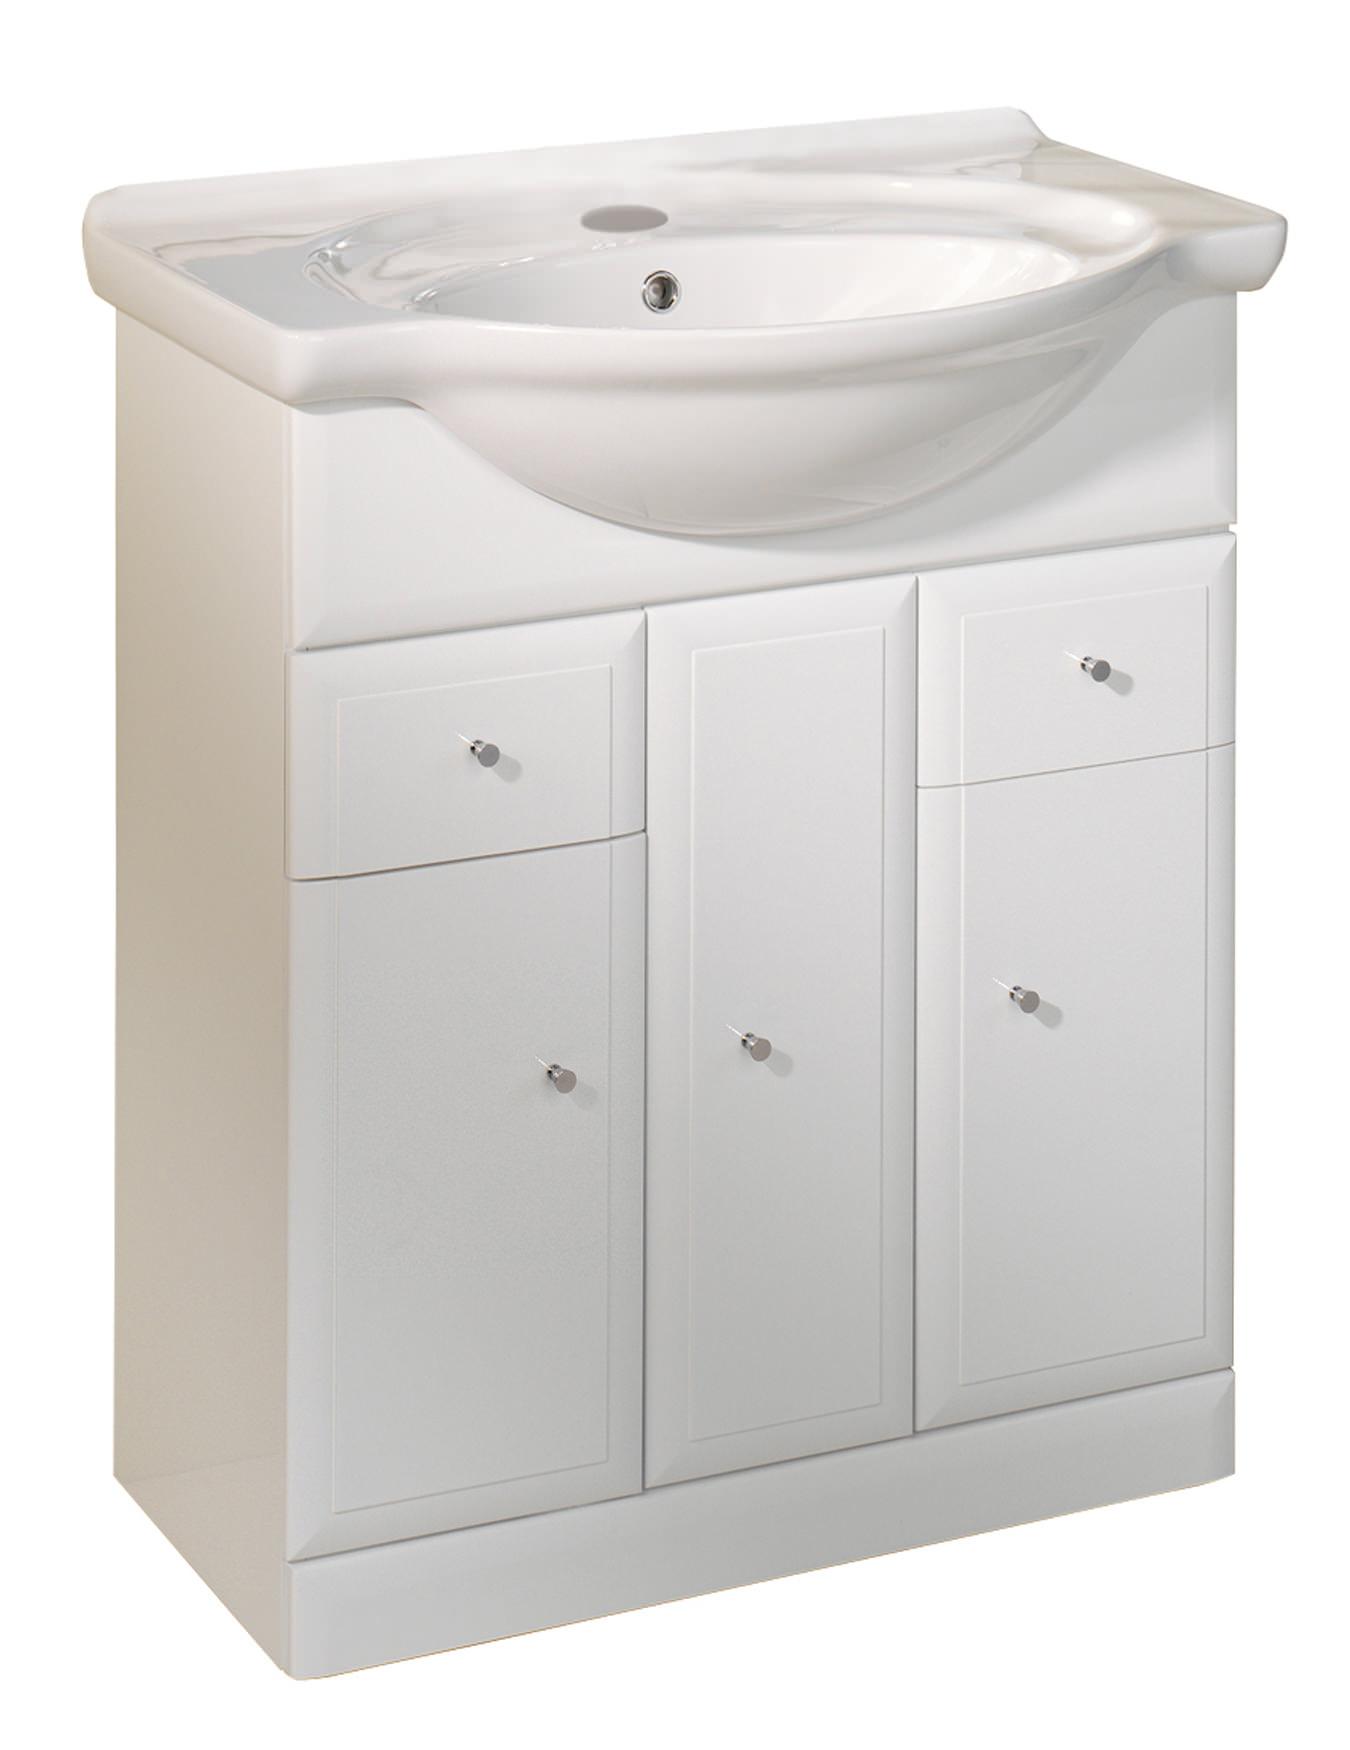 Bathroom Cabinets 700mm roper rhodes valencia 700mm freestanding unit including basin | vb700w